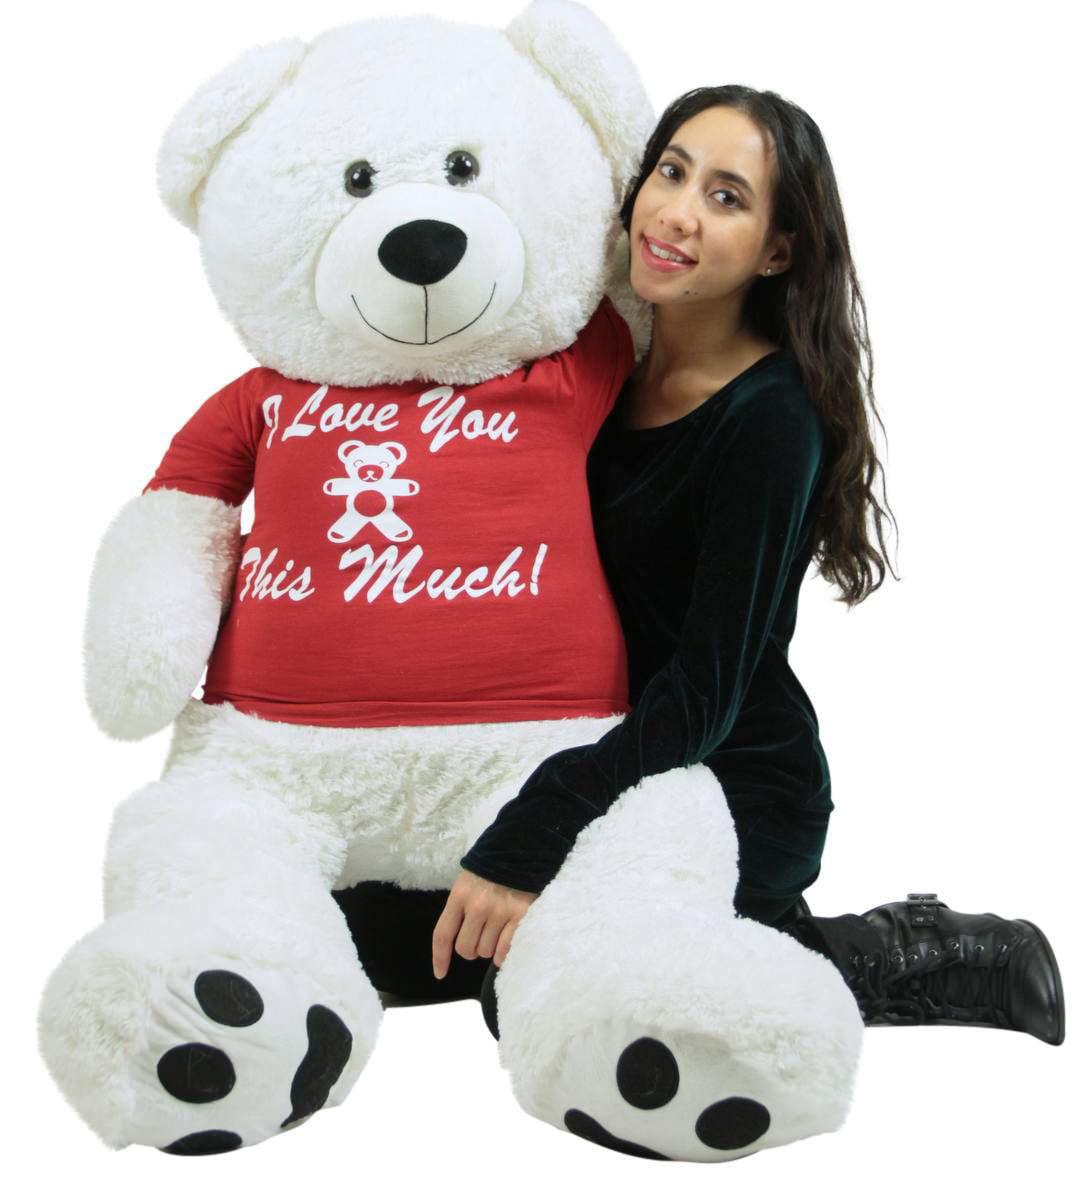 Giant White Teddy Bear 52 Inch Soft Big Plush, Wears Removable T-shirt I